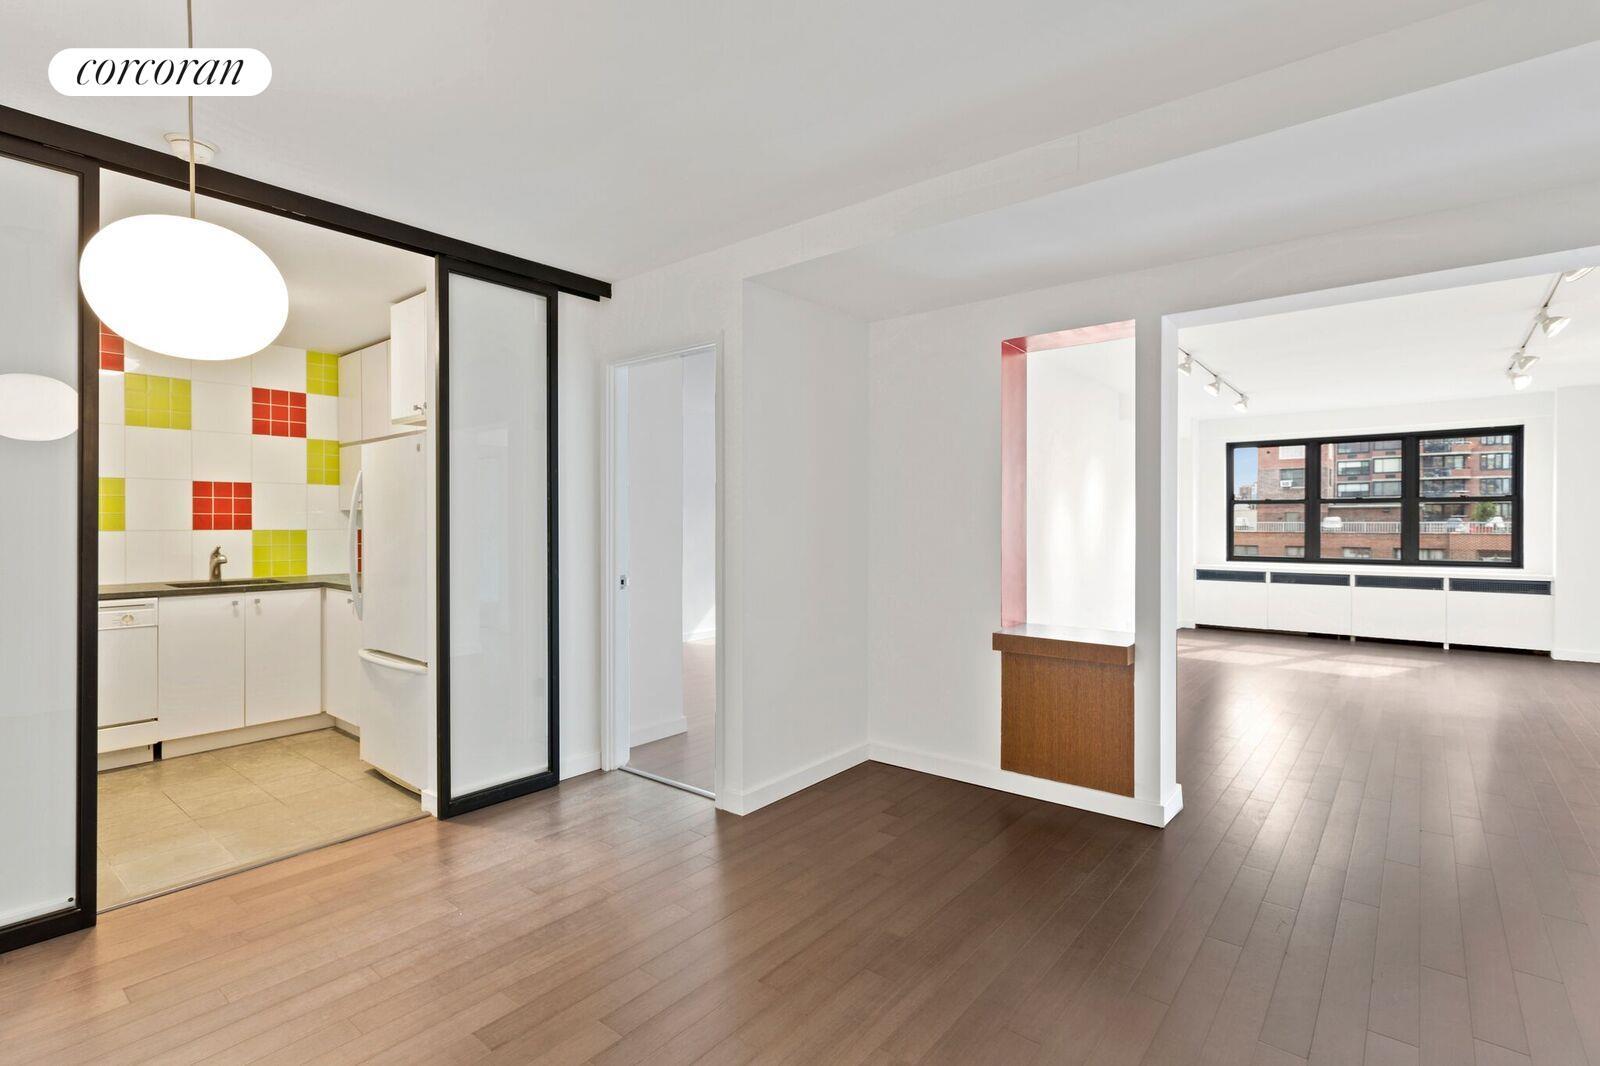 Corcoran, 301 East 63rd Street, Apt  16DE, Upper East Side Rentals